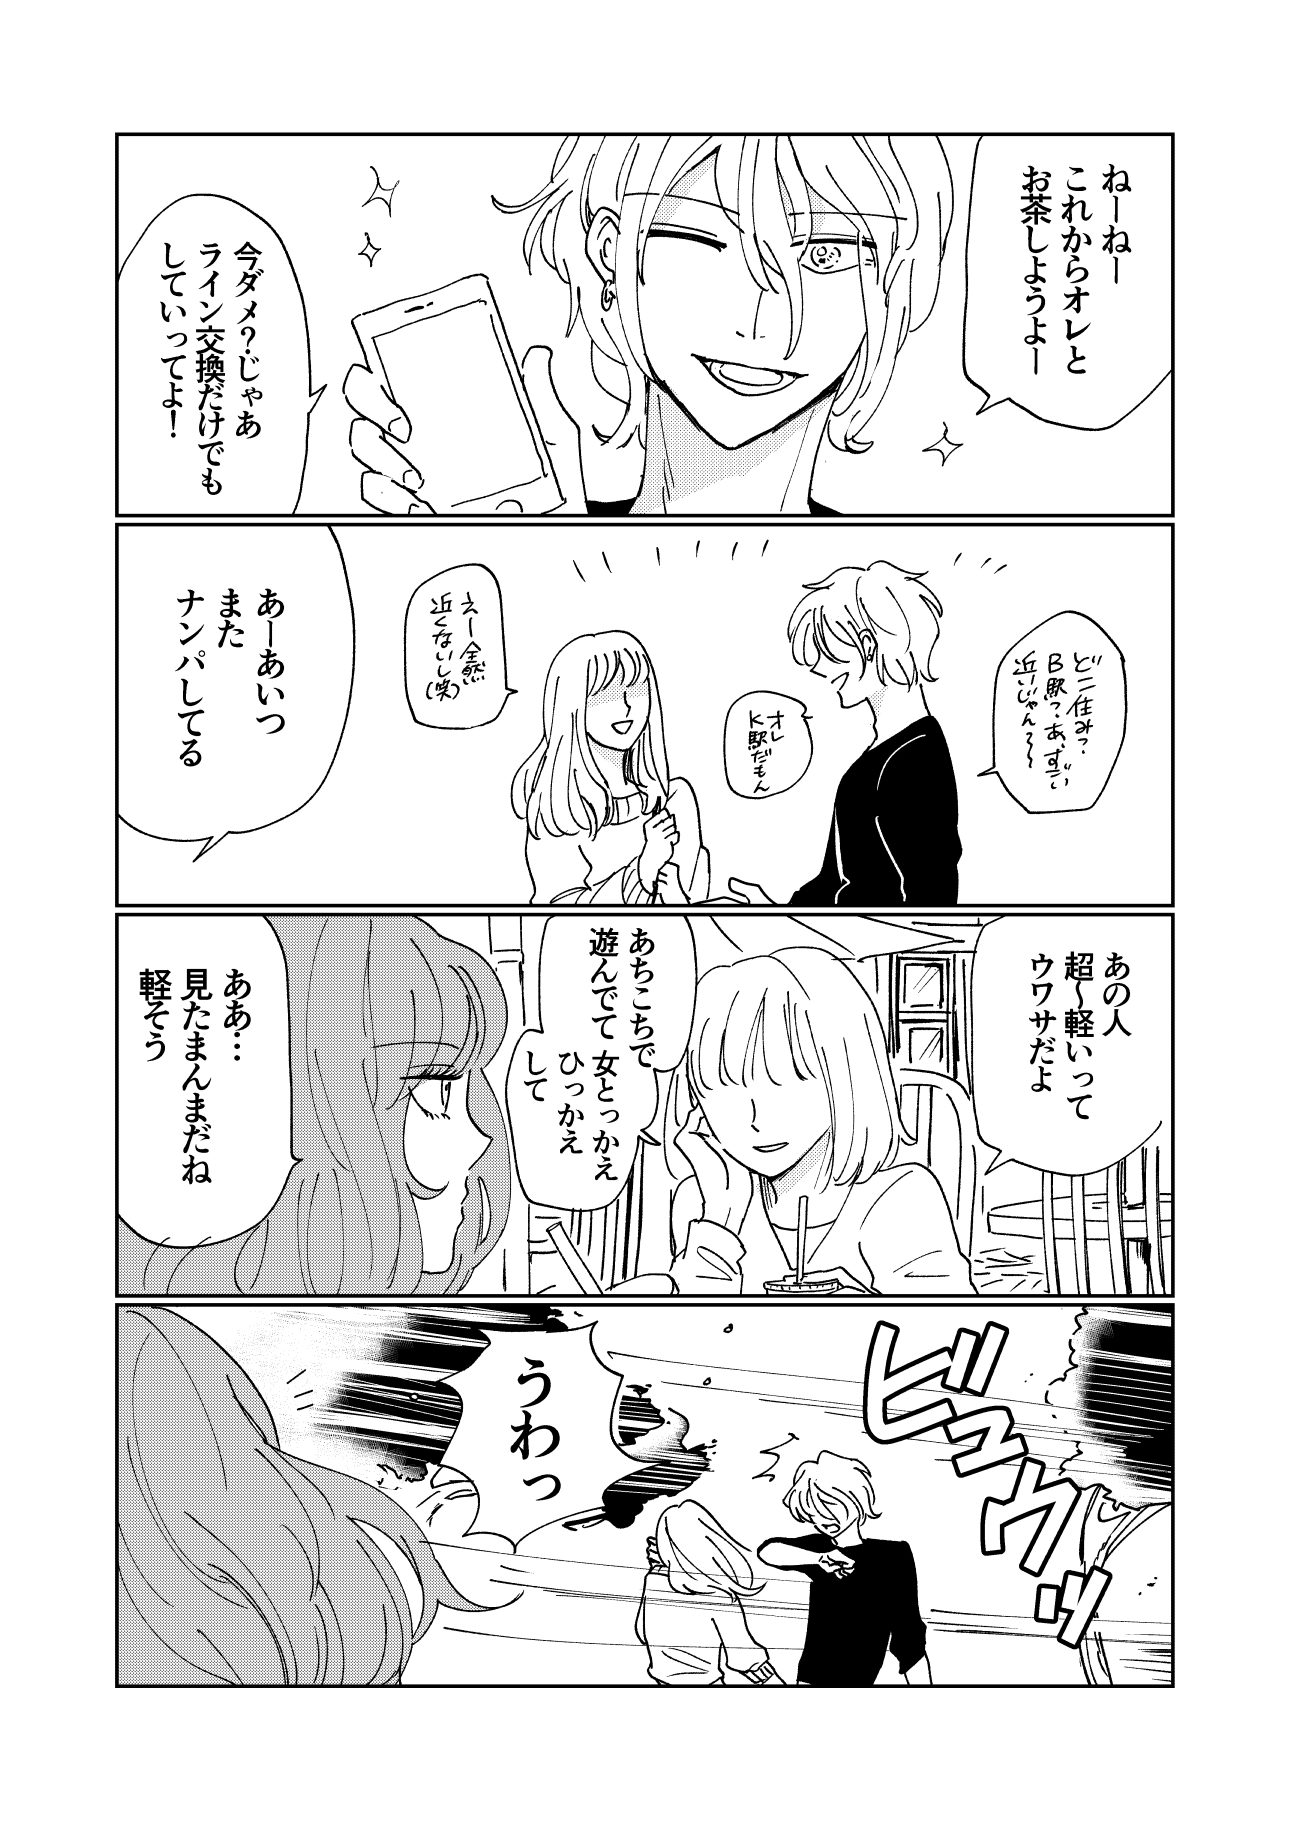 f:id:kanemotonomukuu:20190212204707j:plain